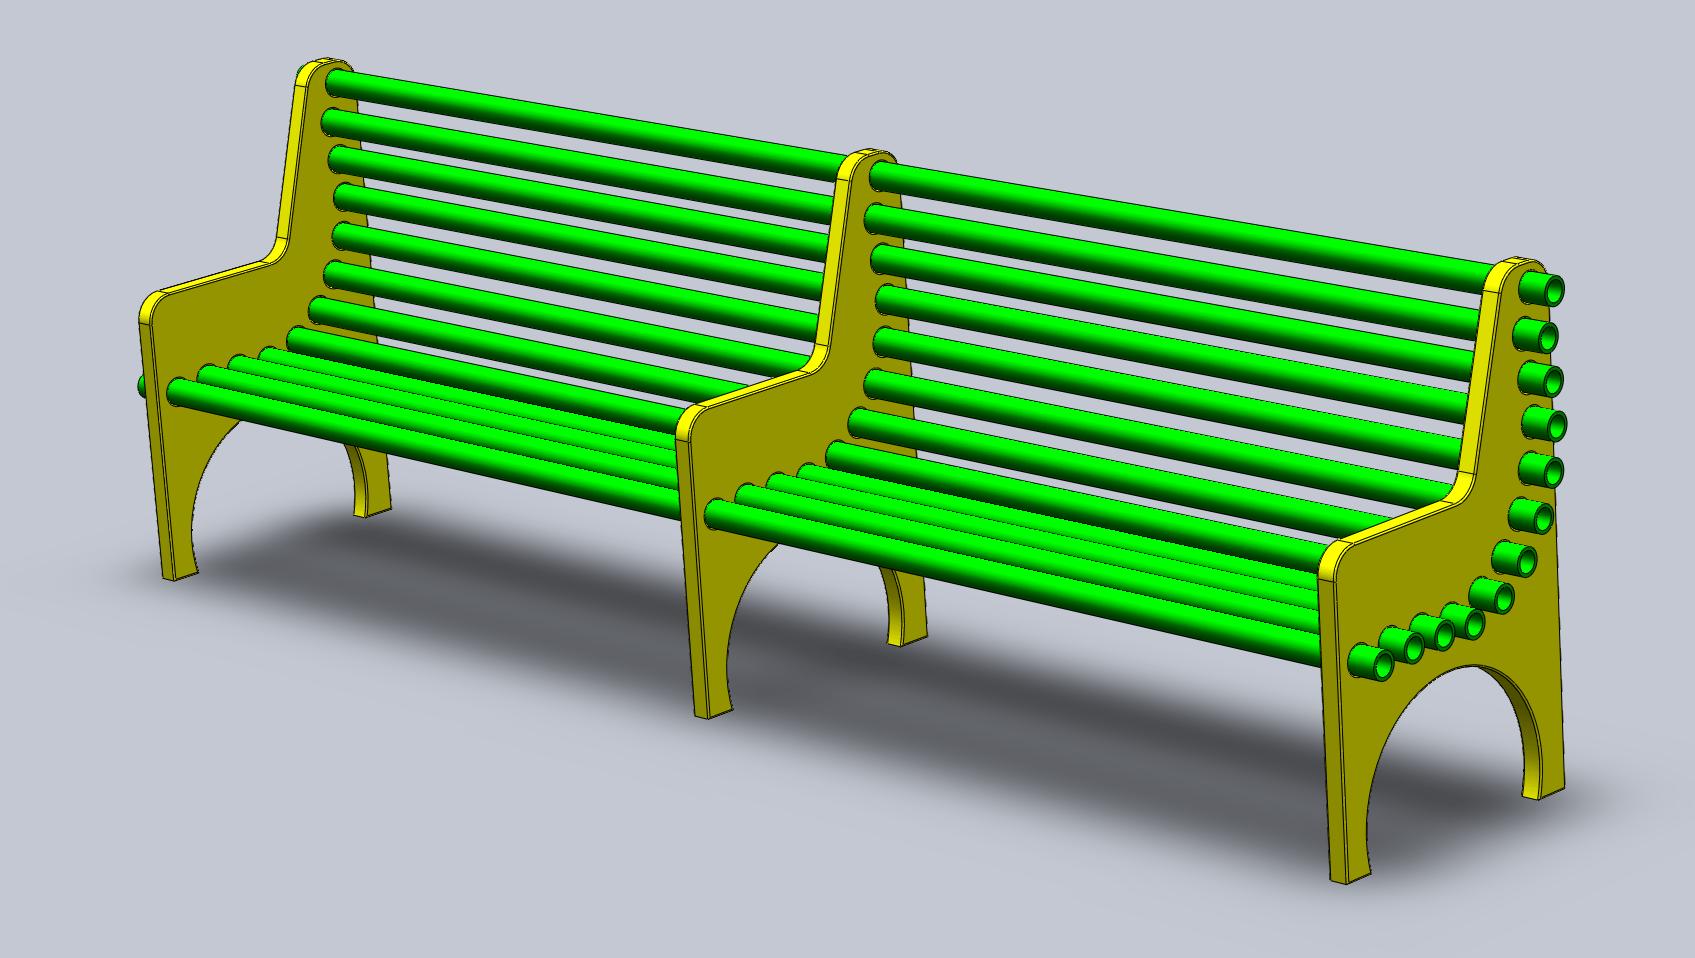 diy pvc pipe sofa art mebel bench  the gahooa perspective